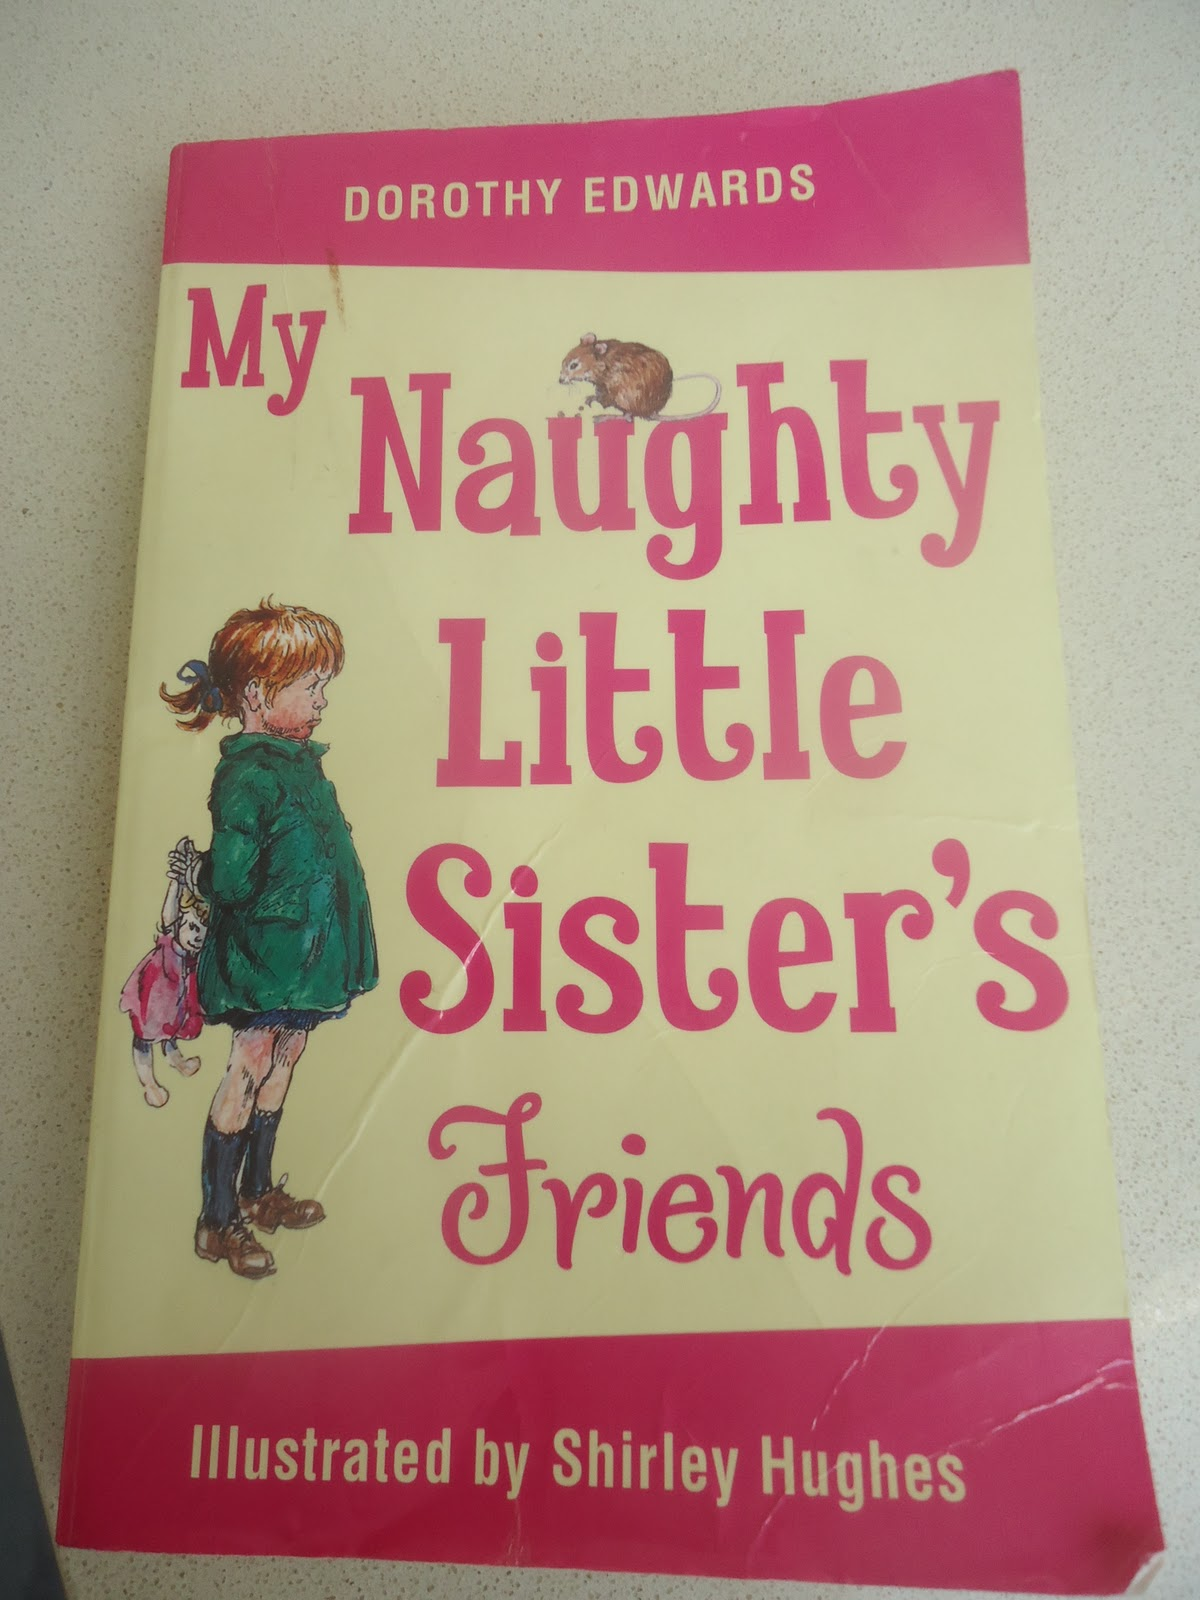 naughty sister